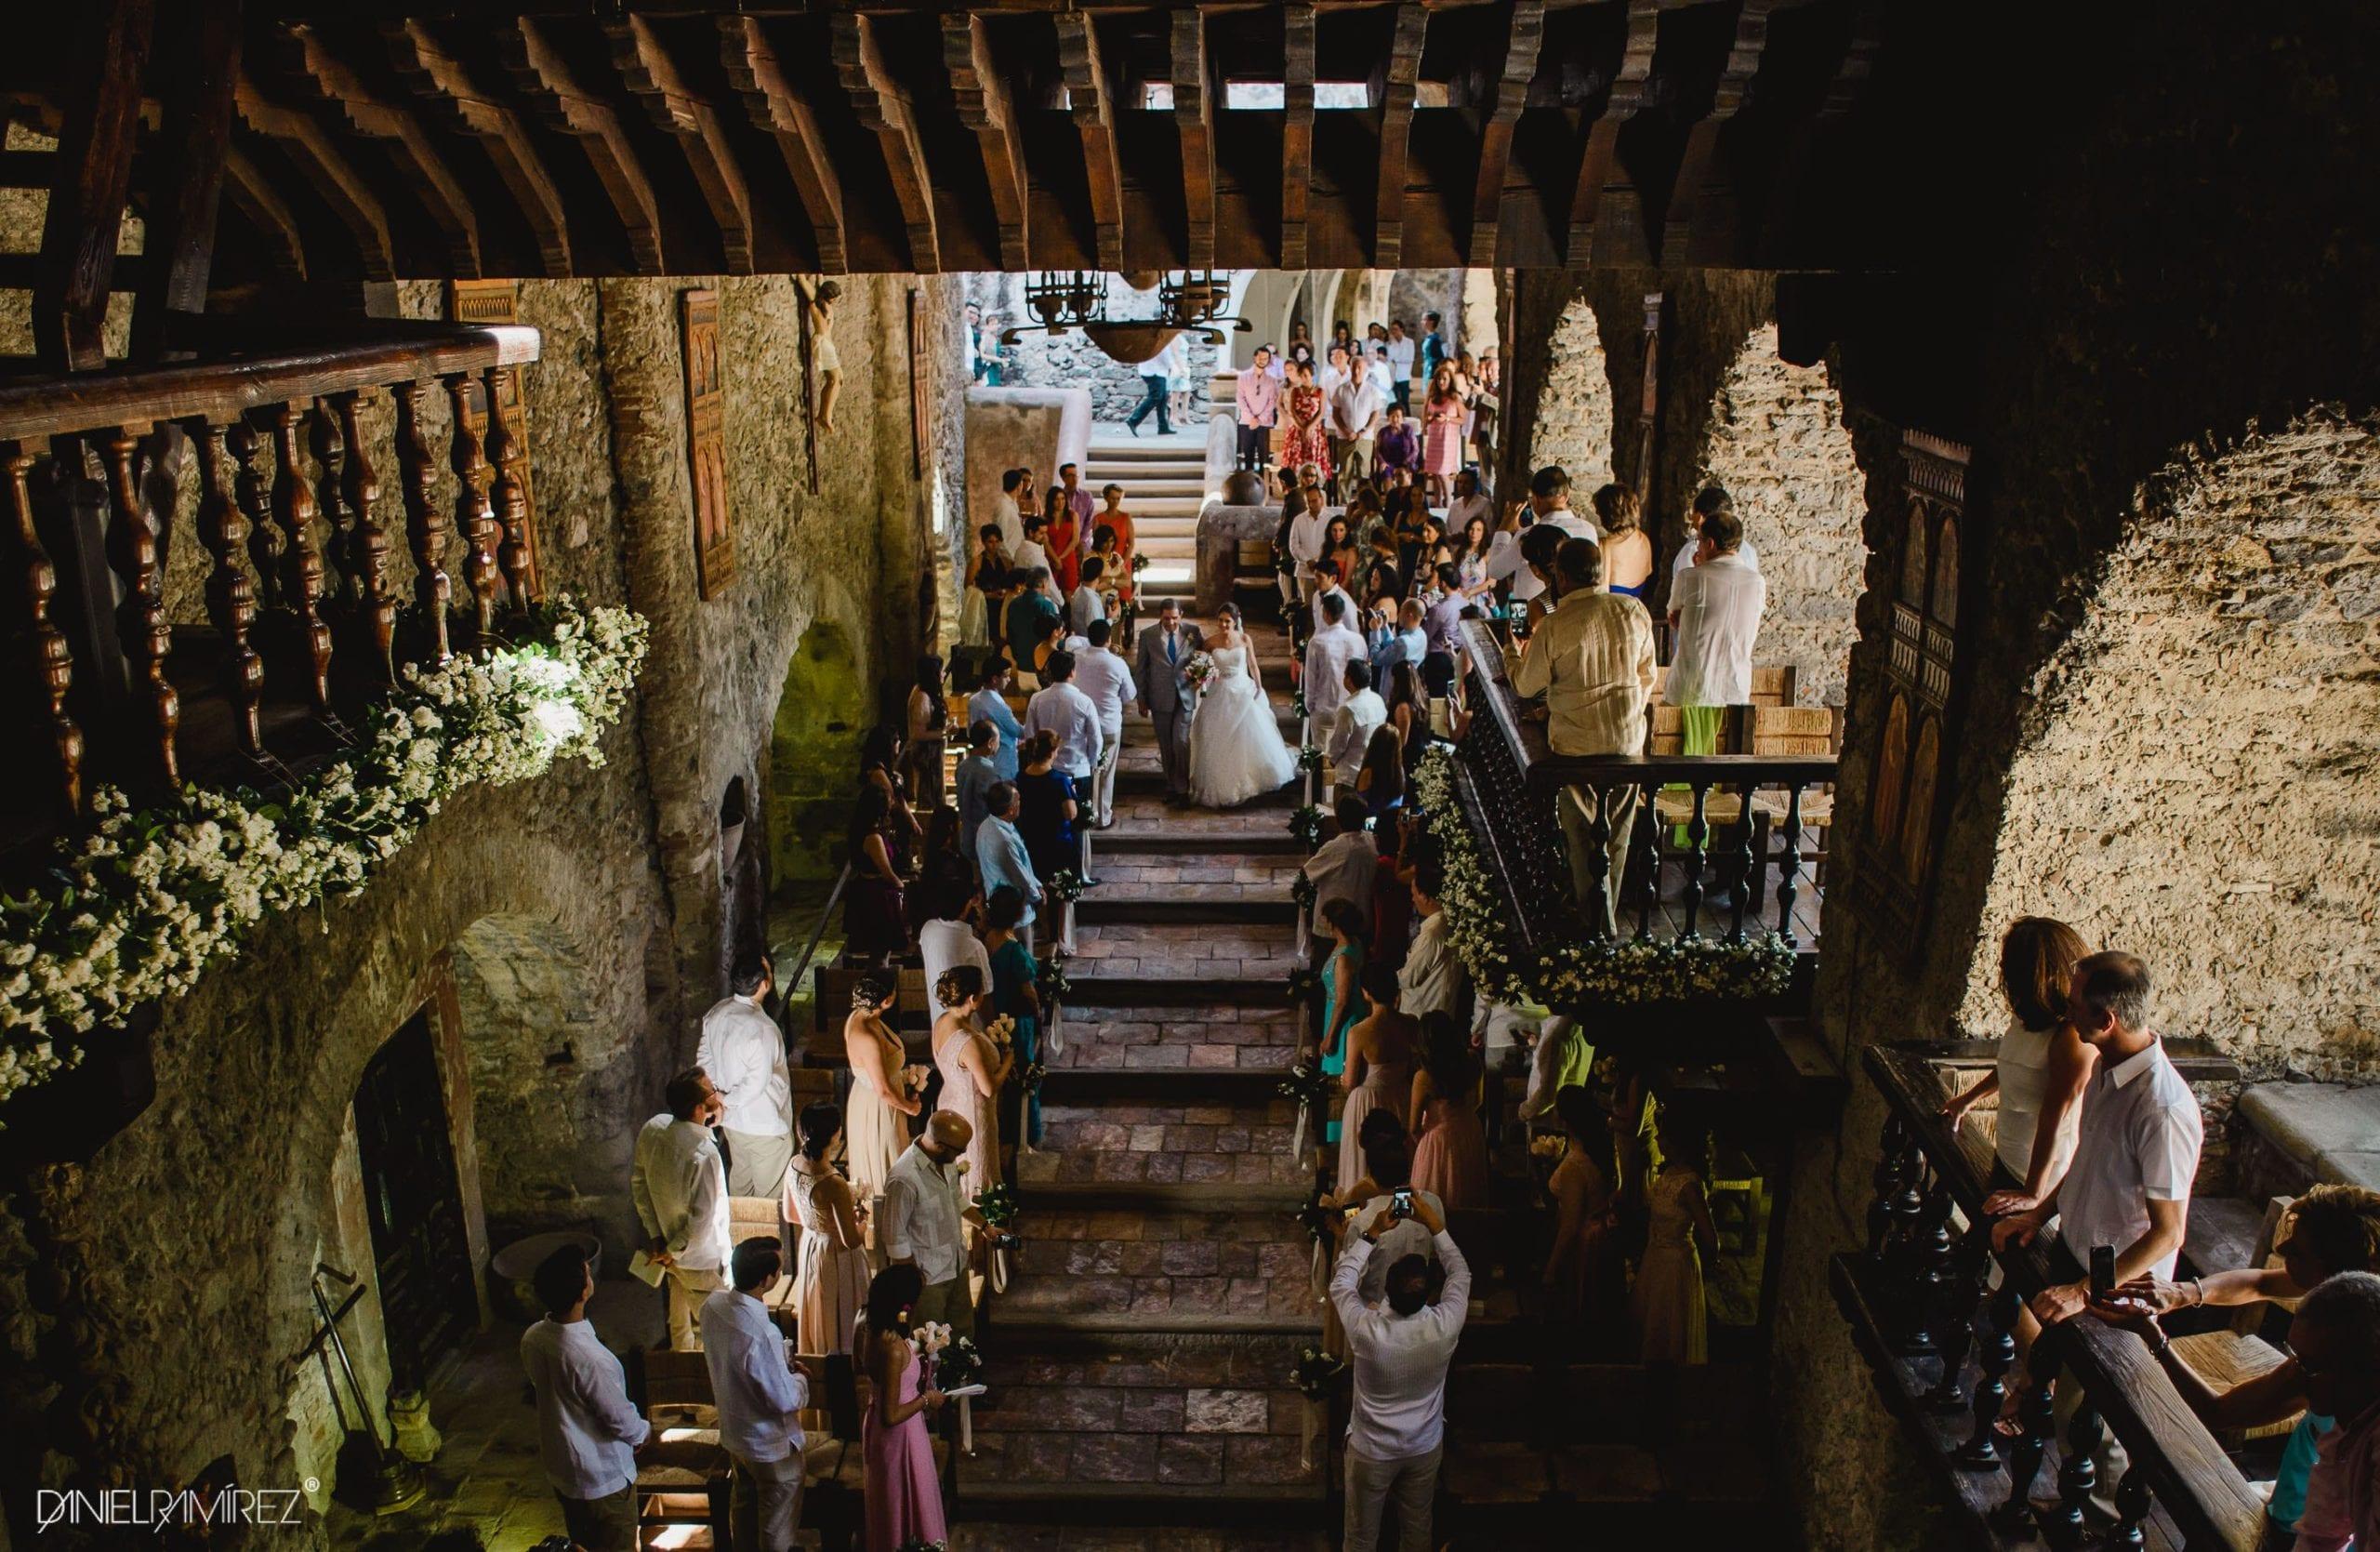 capilla hacienda chiconcuac